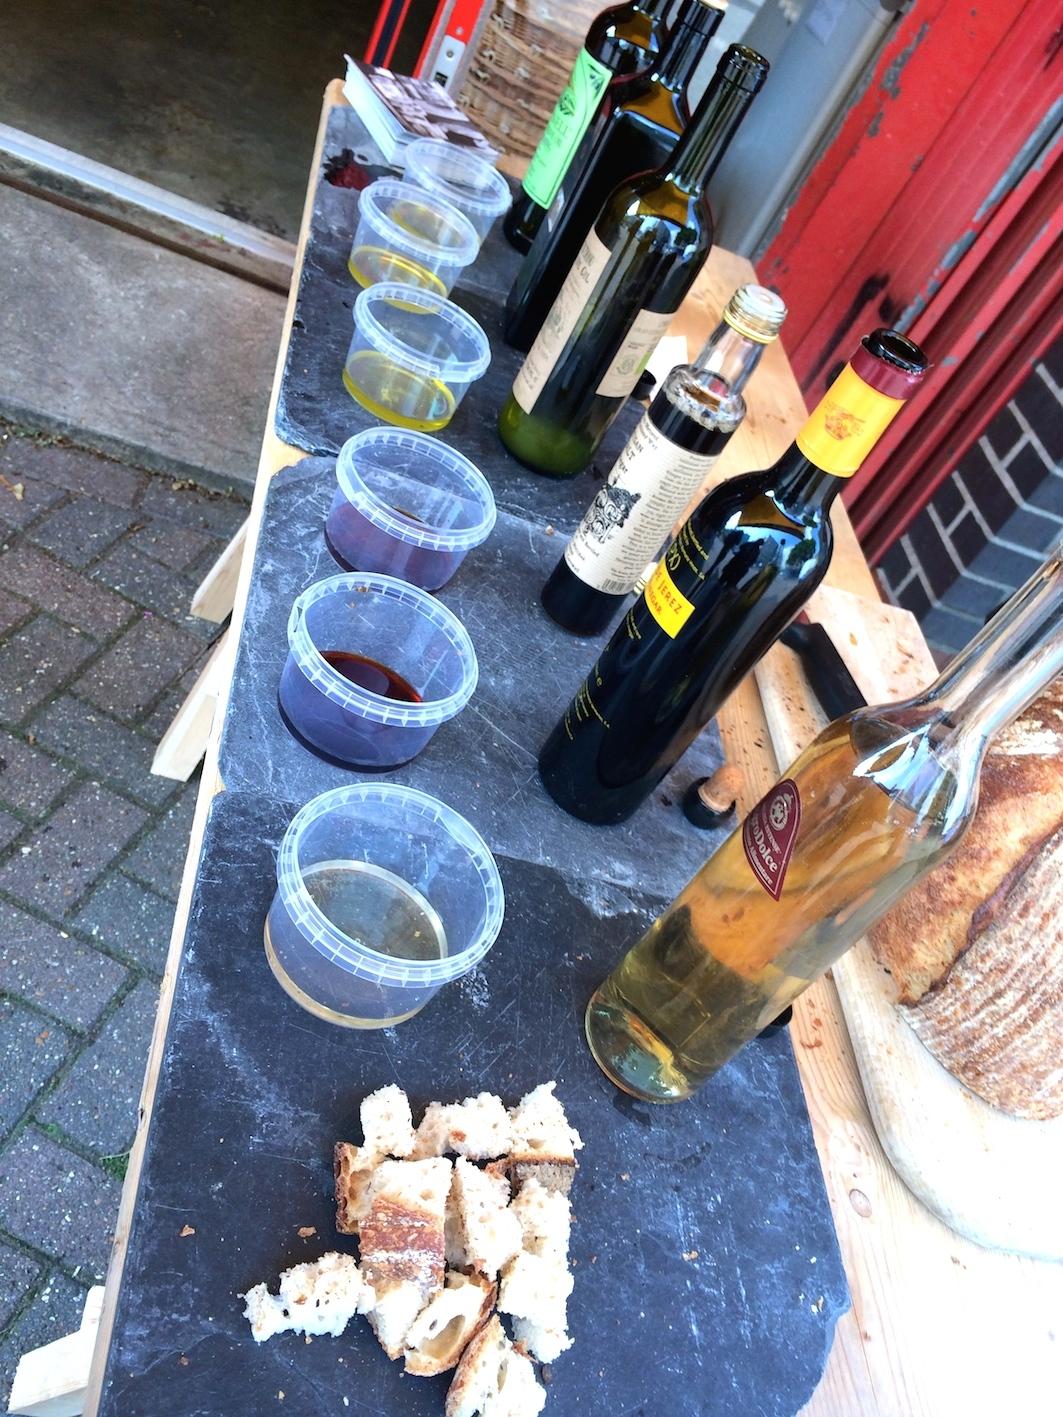 Olive oils and vinegars